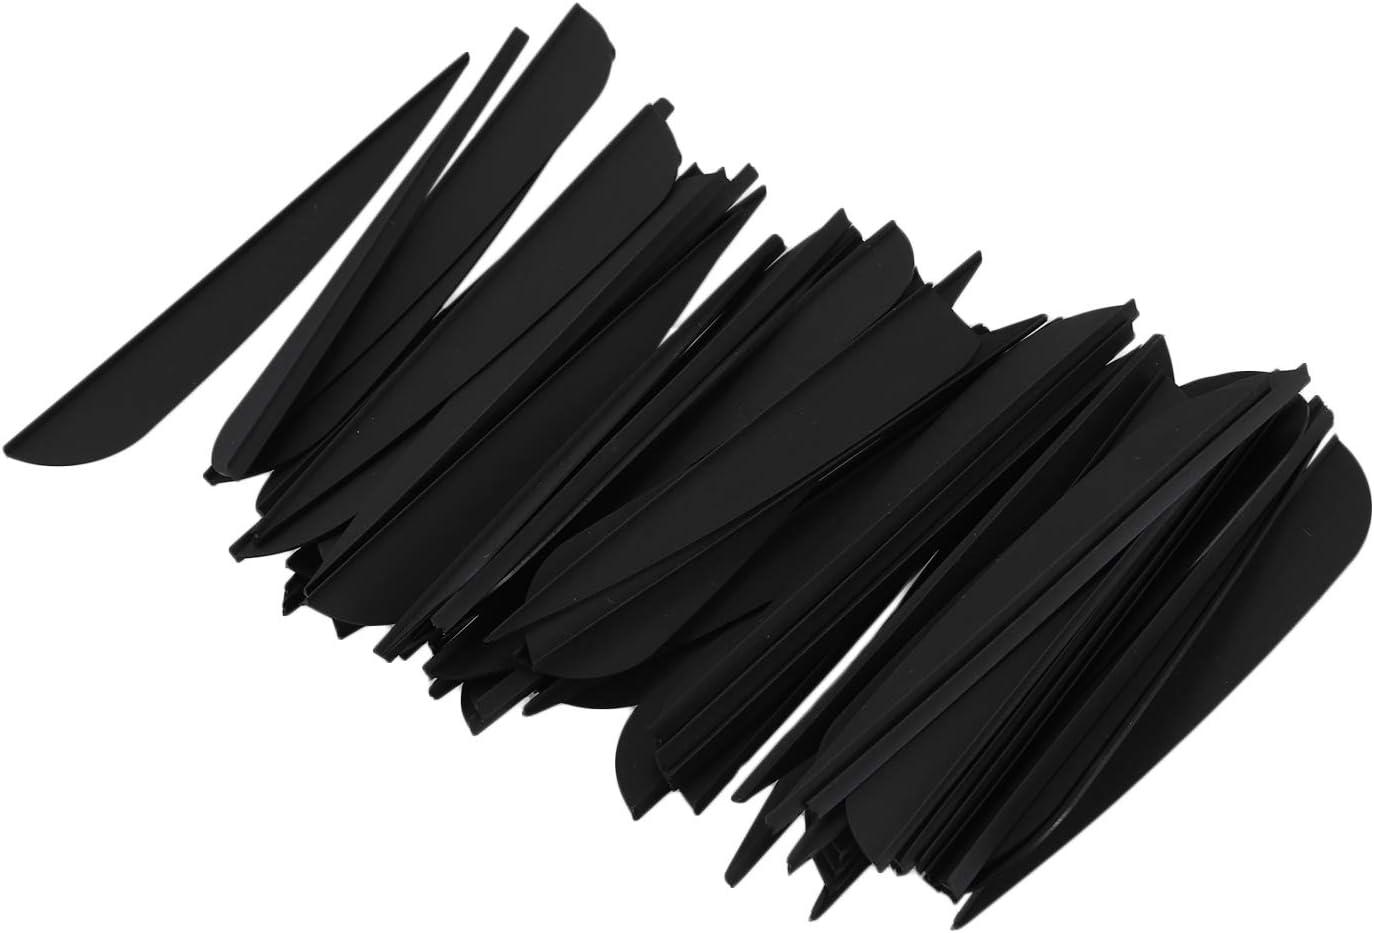 Fauge Arrows Vanes 4 Inch Plastic Feather Fletching for DIY Archery Arrows 50 Pack Black